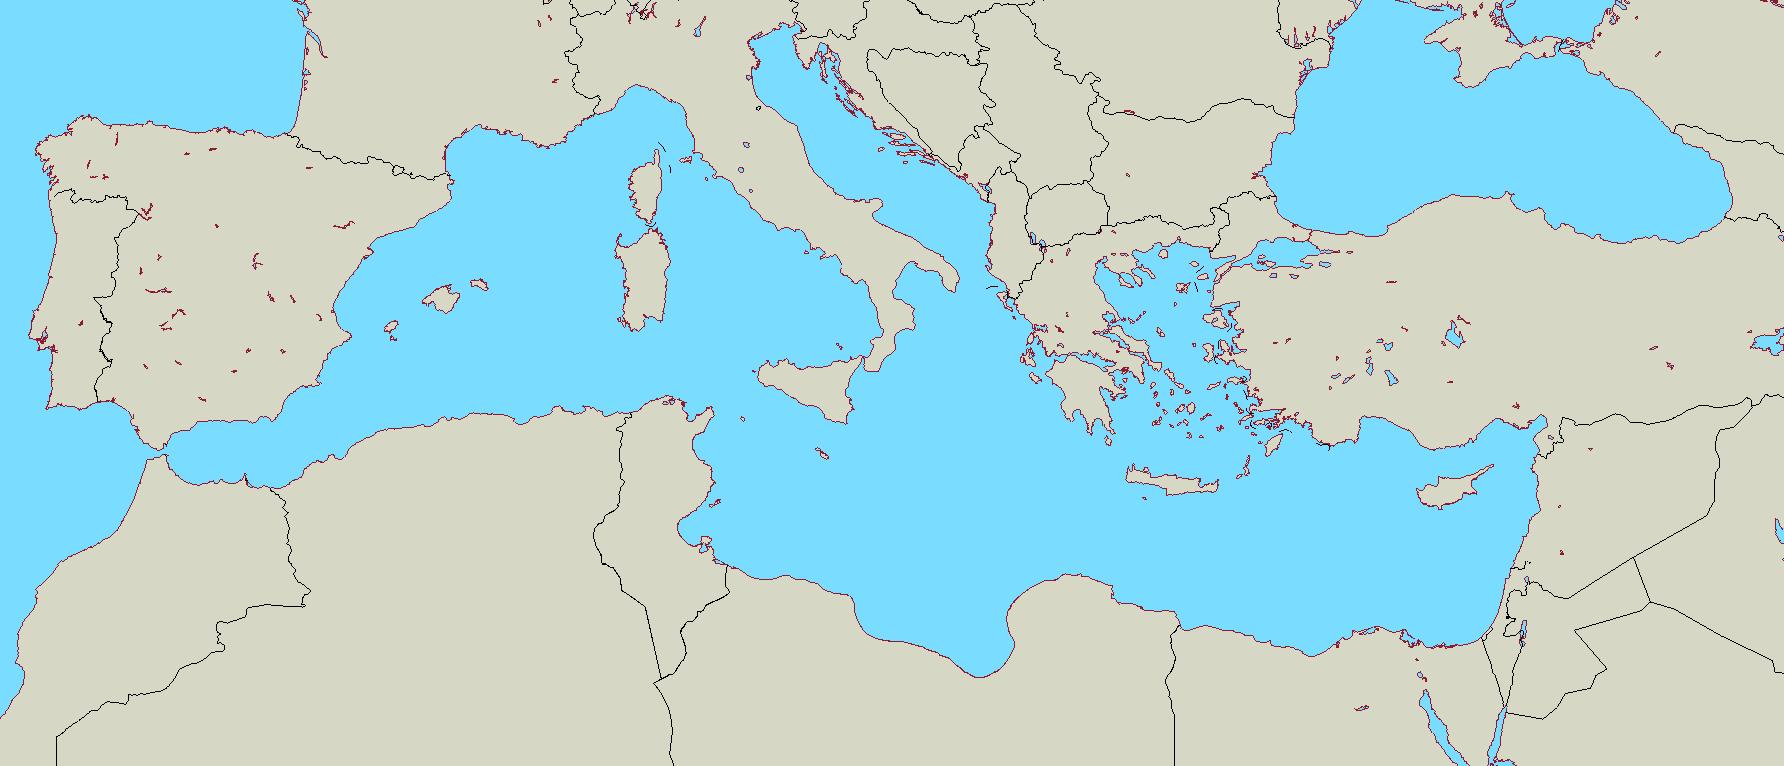 blankmapdirectoryallofeurope2 alternatehistorycom wiki